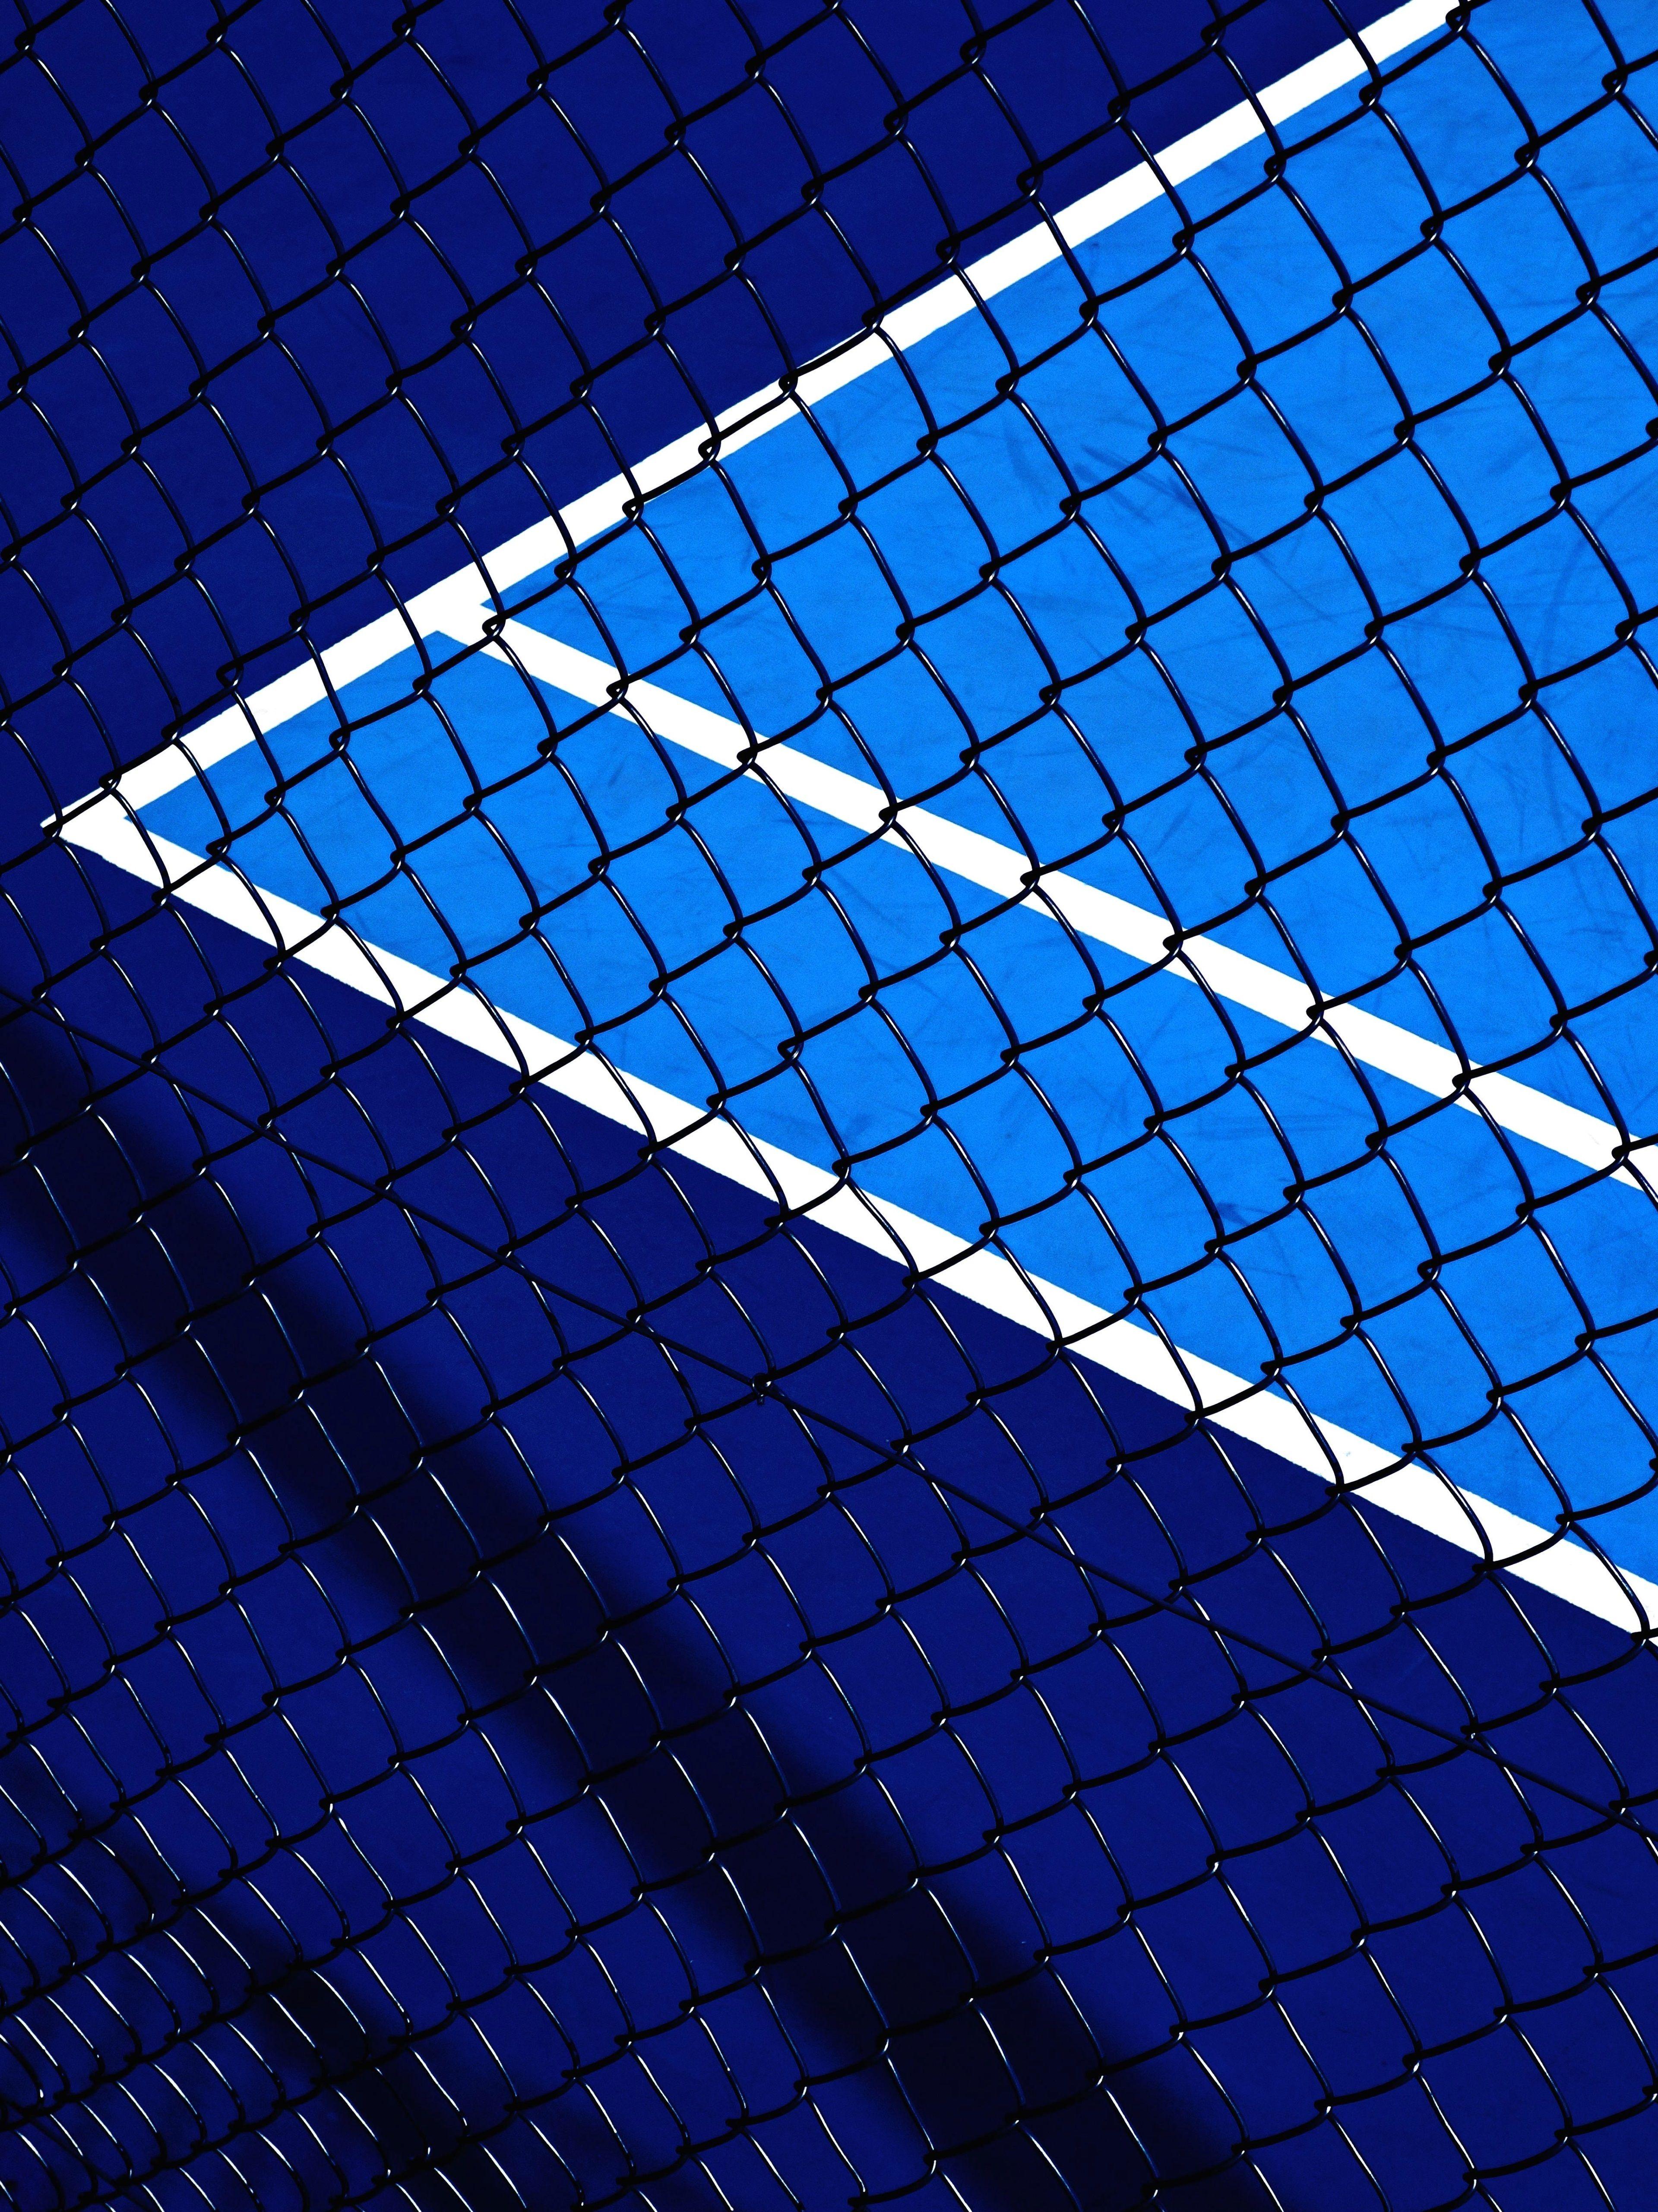 3840x5122 tennis court 4k screen wallpaper hd Aesthetic